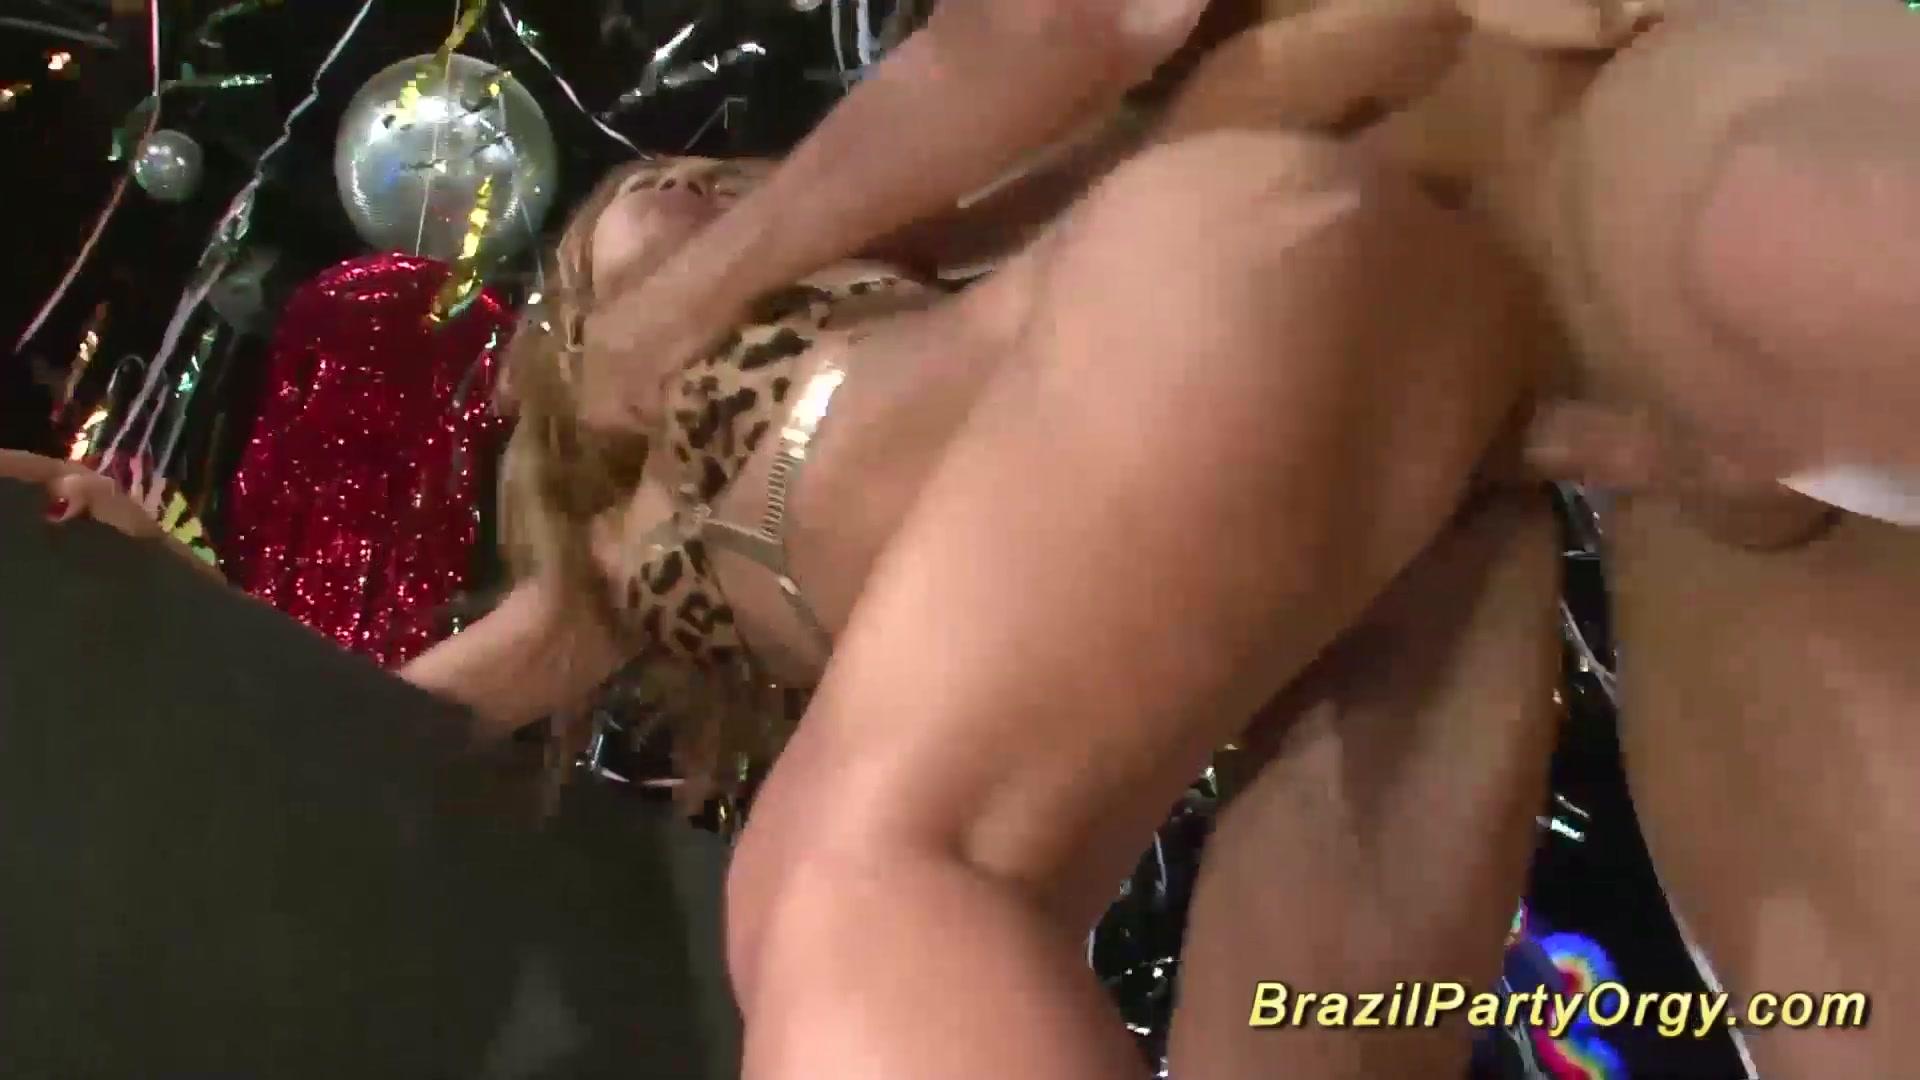 Sexy xXx Base pix Geschworene jungfrauen albanien dating